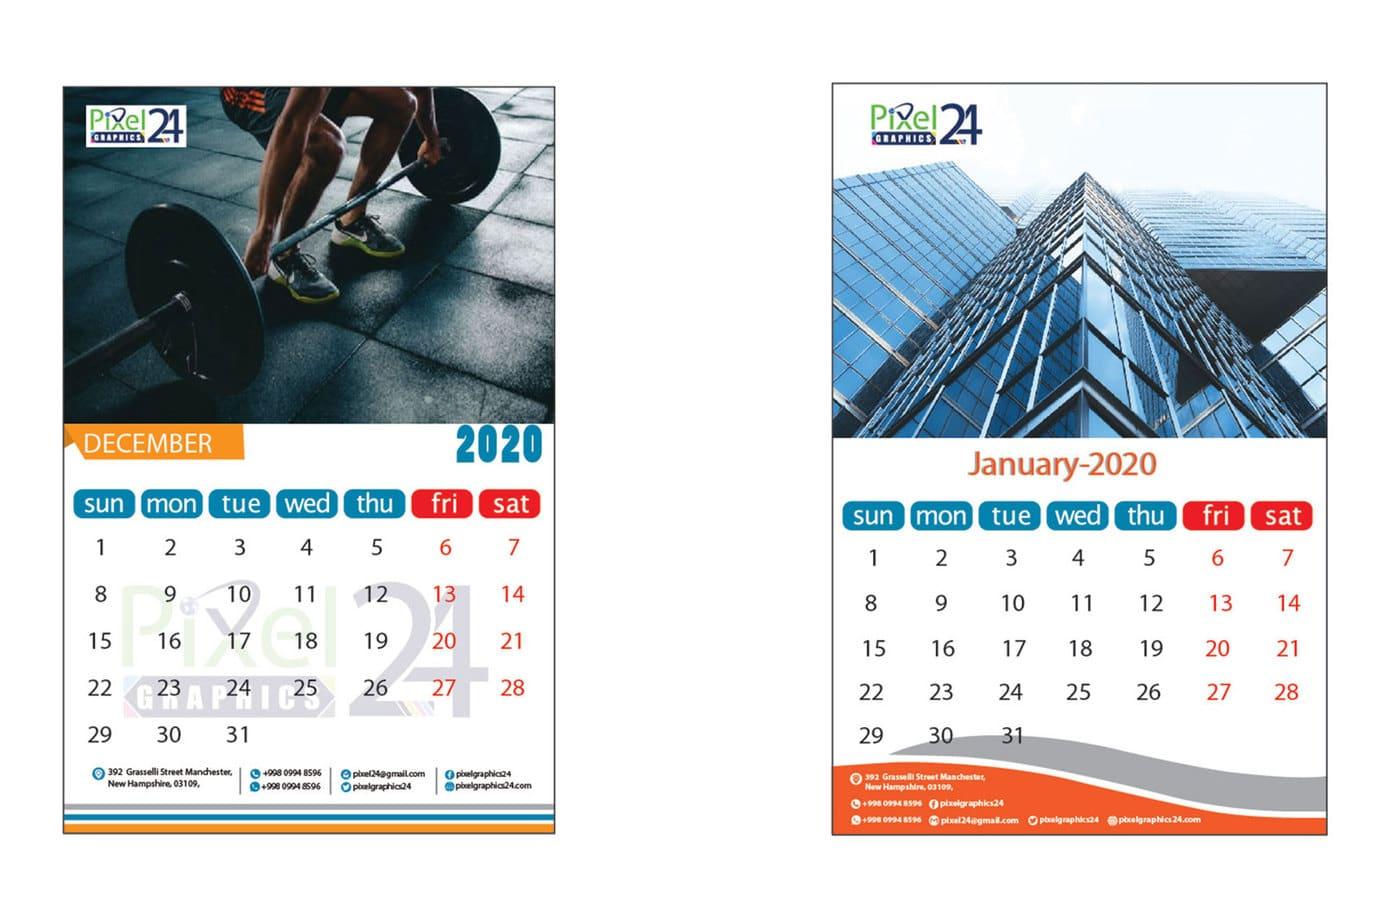 Calendar design, creative calendar design, print media services, graphics design serviCalendar design, creative calendar design, print media services, graphics design services, it solution parkces, it solution park